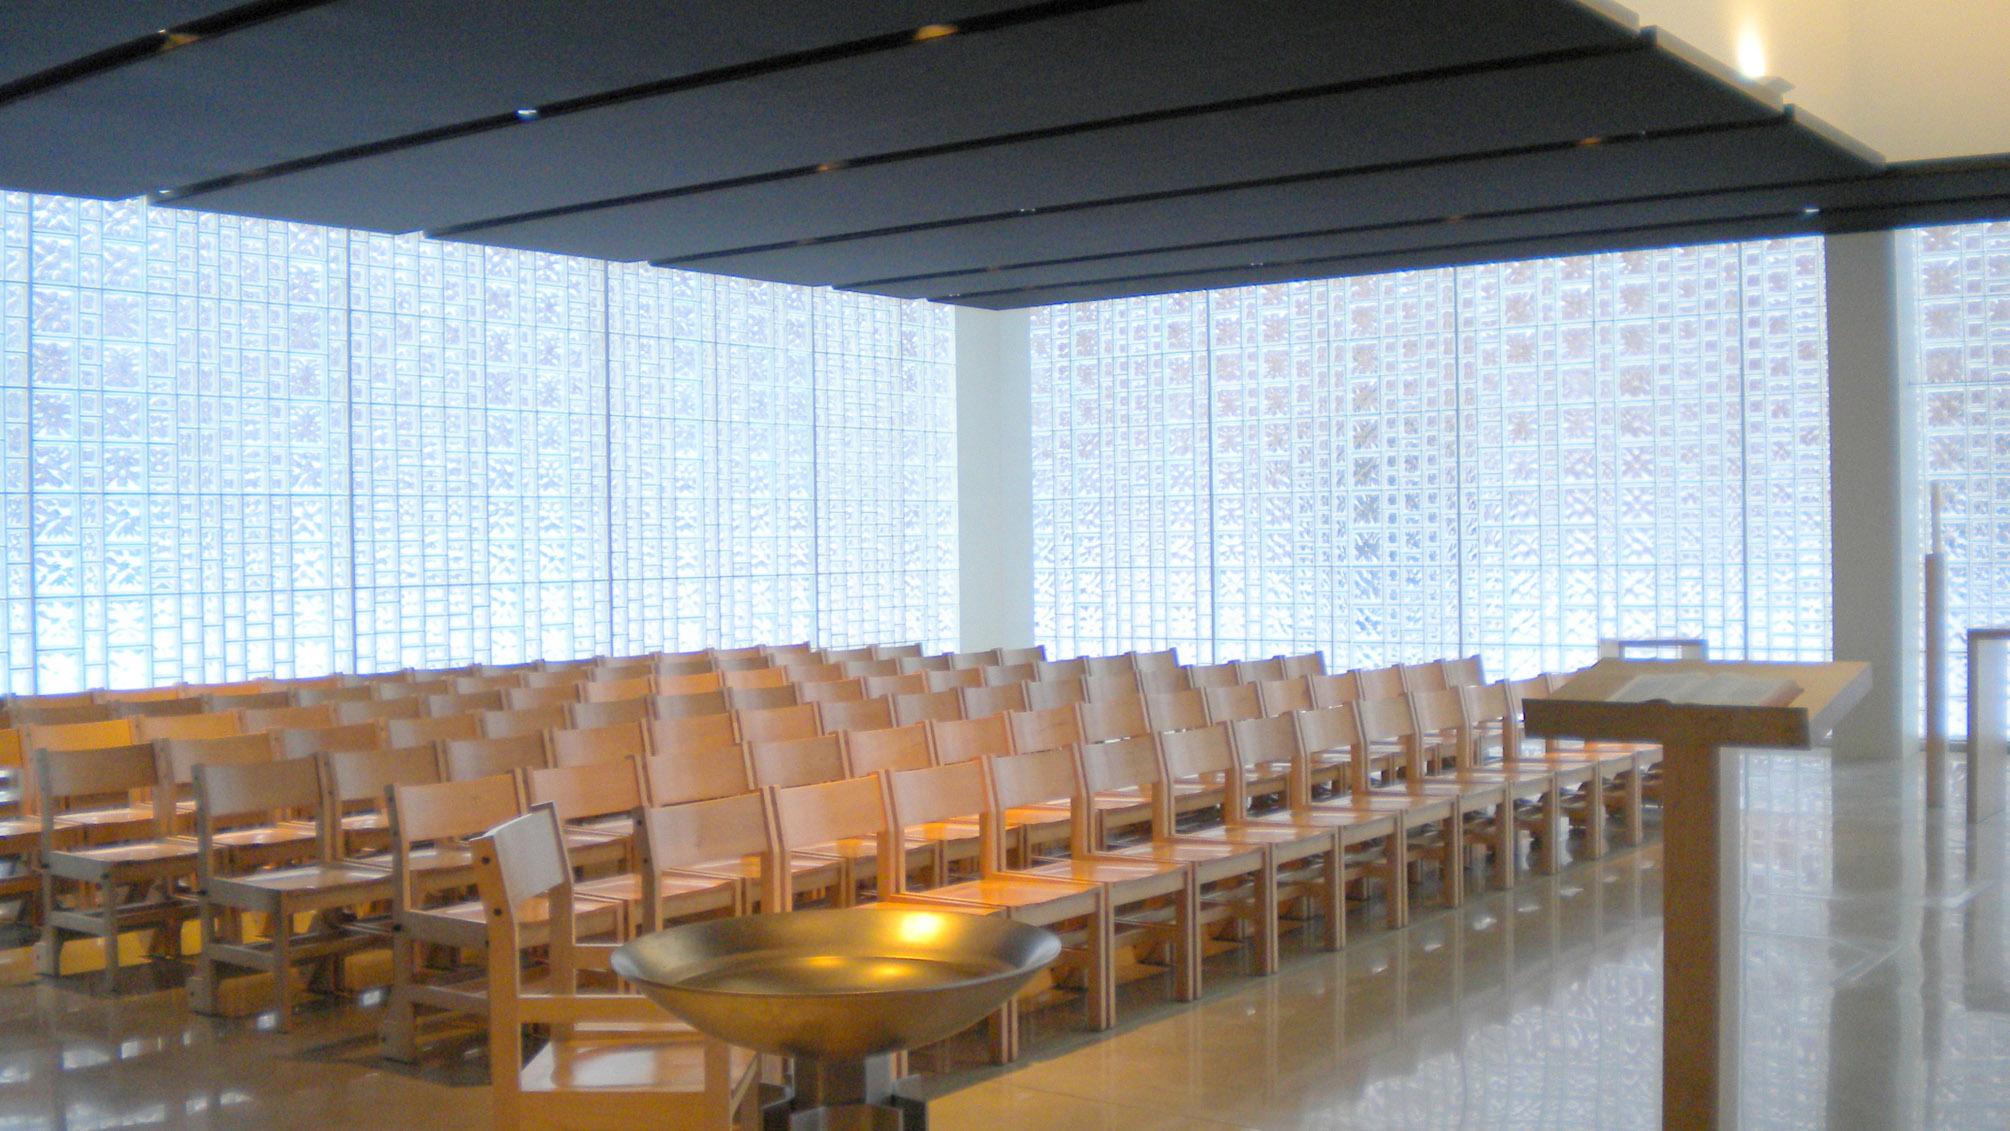 Christ the King Jesuit College Preparatory School